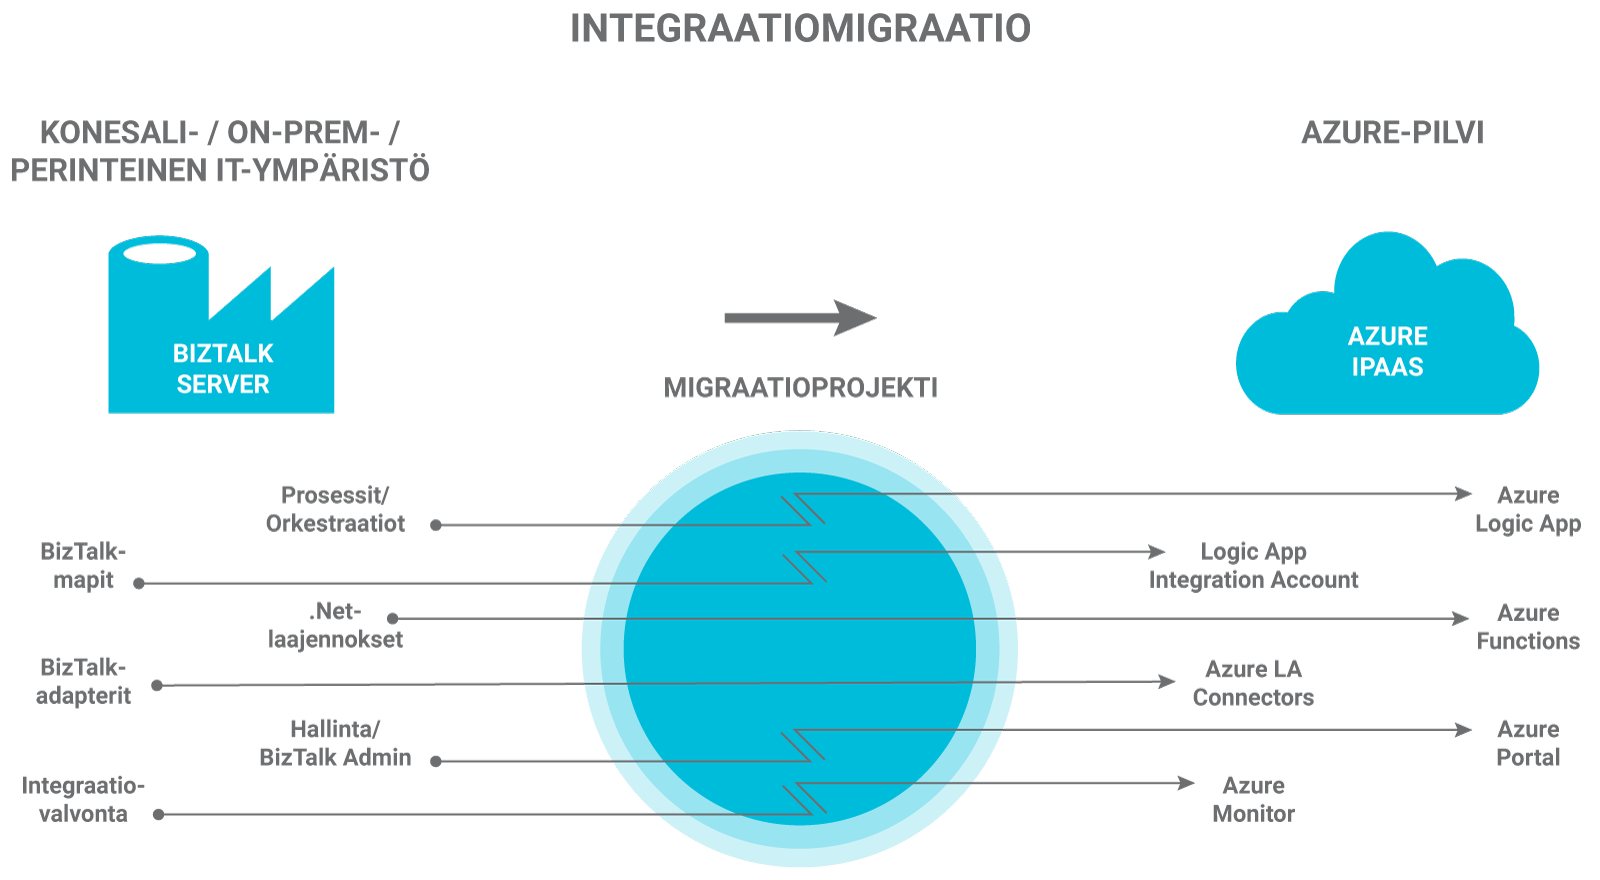 VR-Track-Integraatiomigraatio